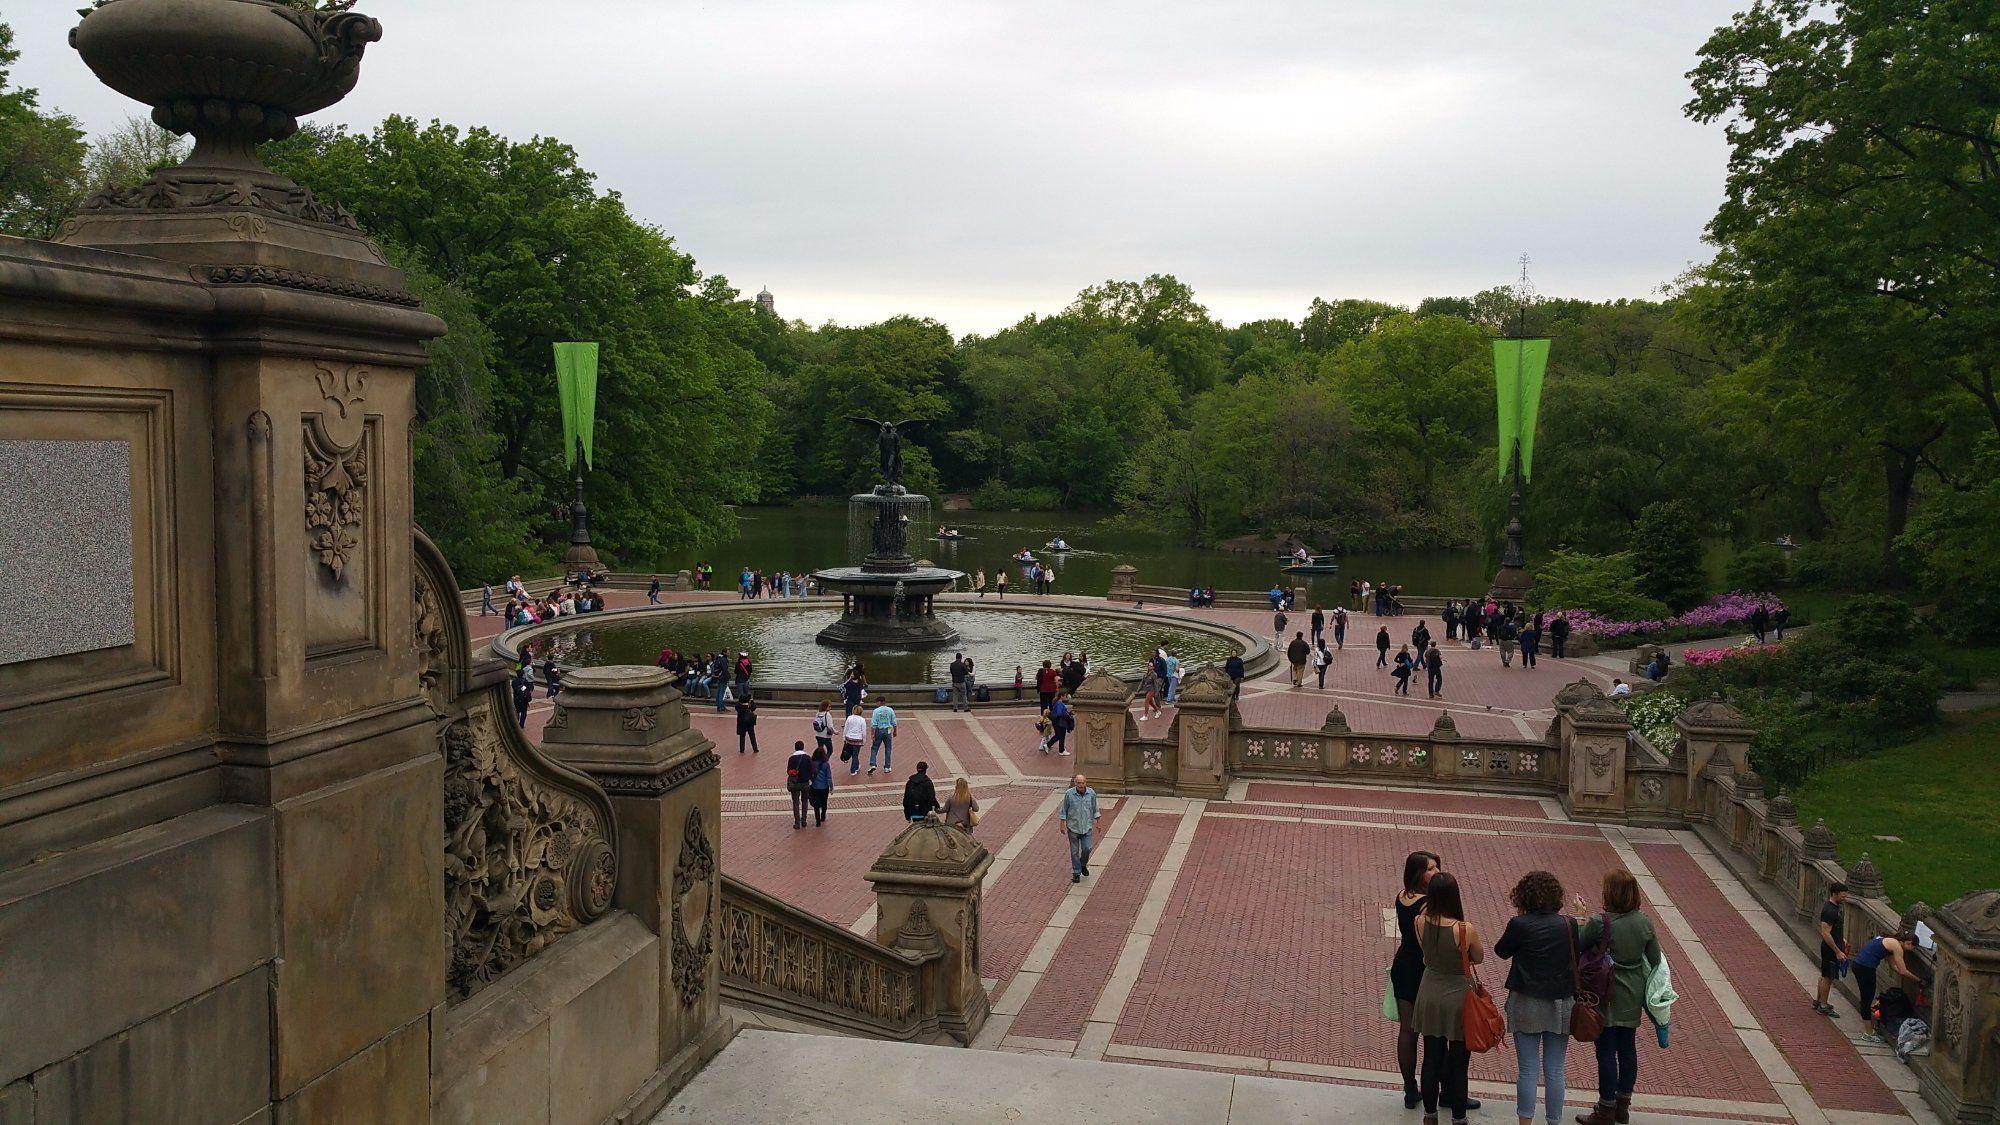 Central Park (New York City): Top Tips Before You Go - TripAdvisor